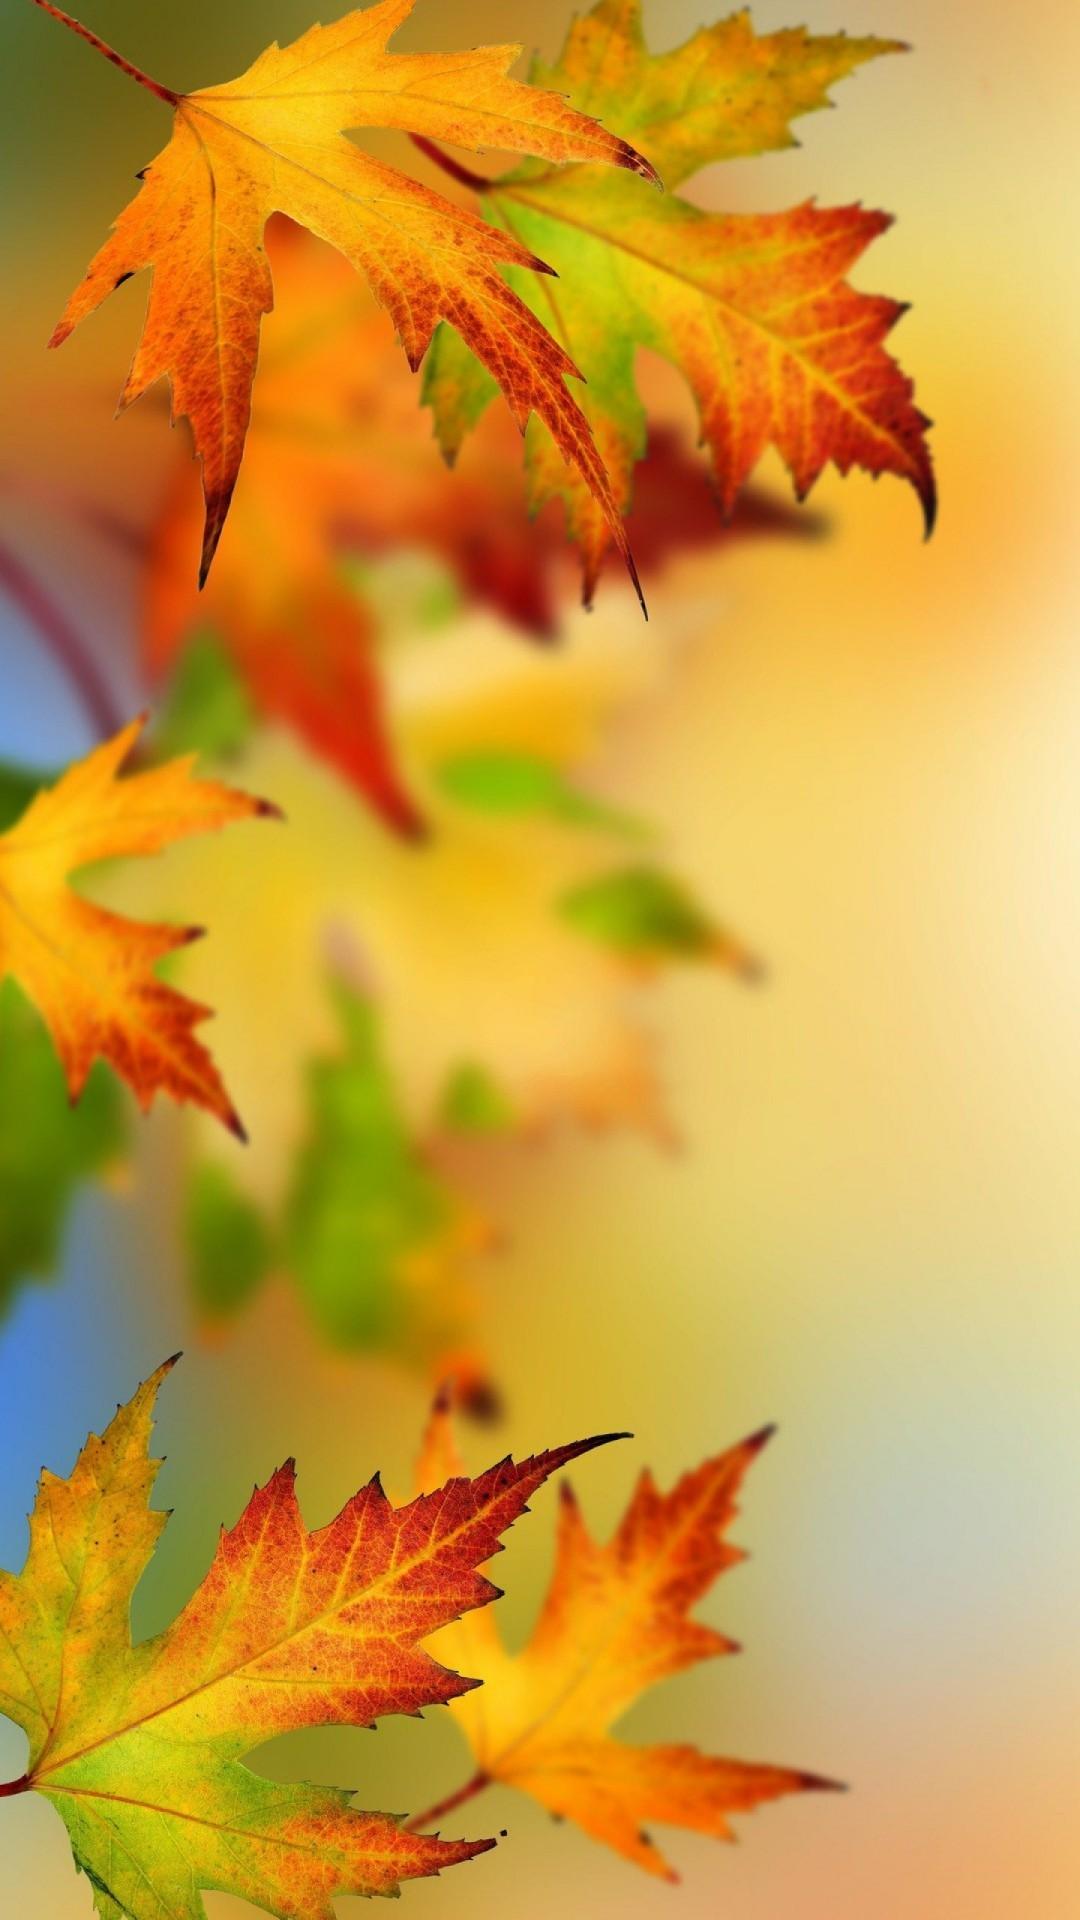 autumn wallpaper iphone